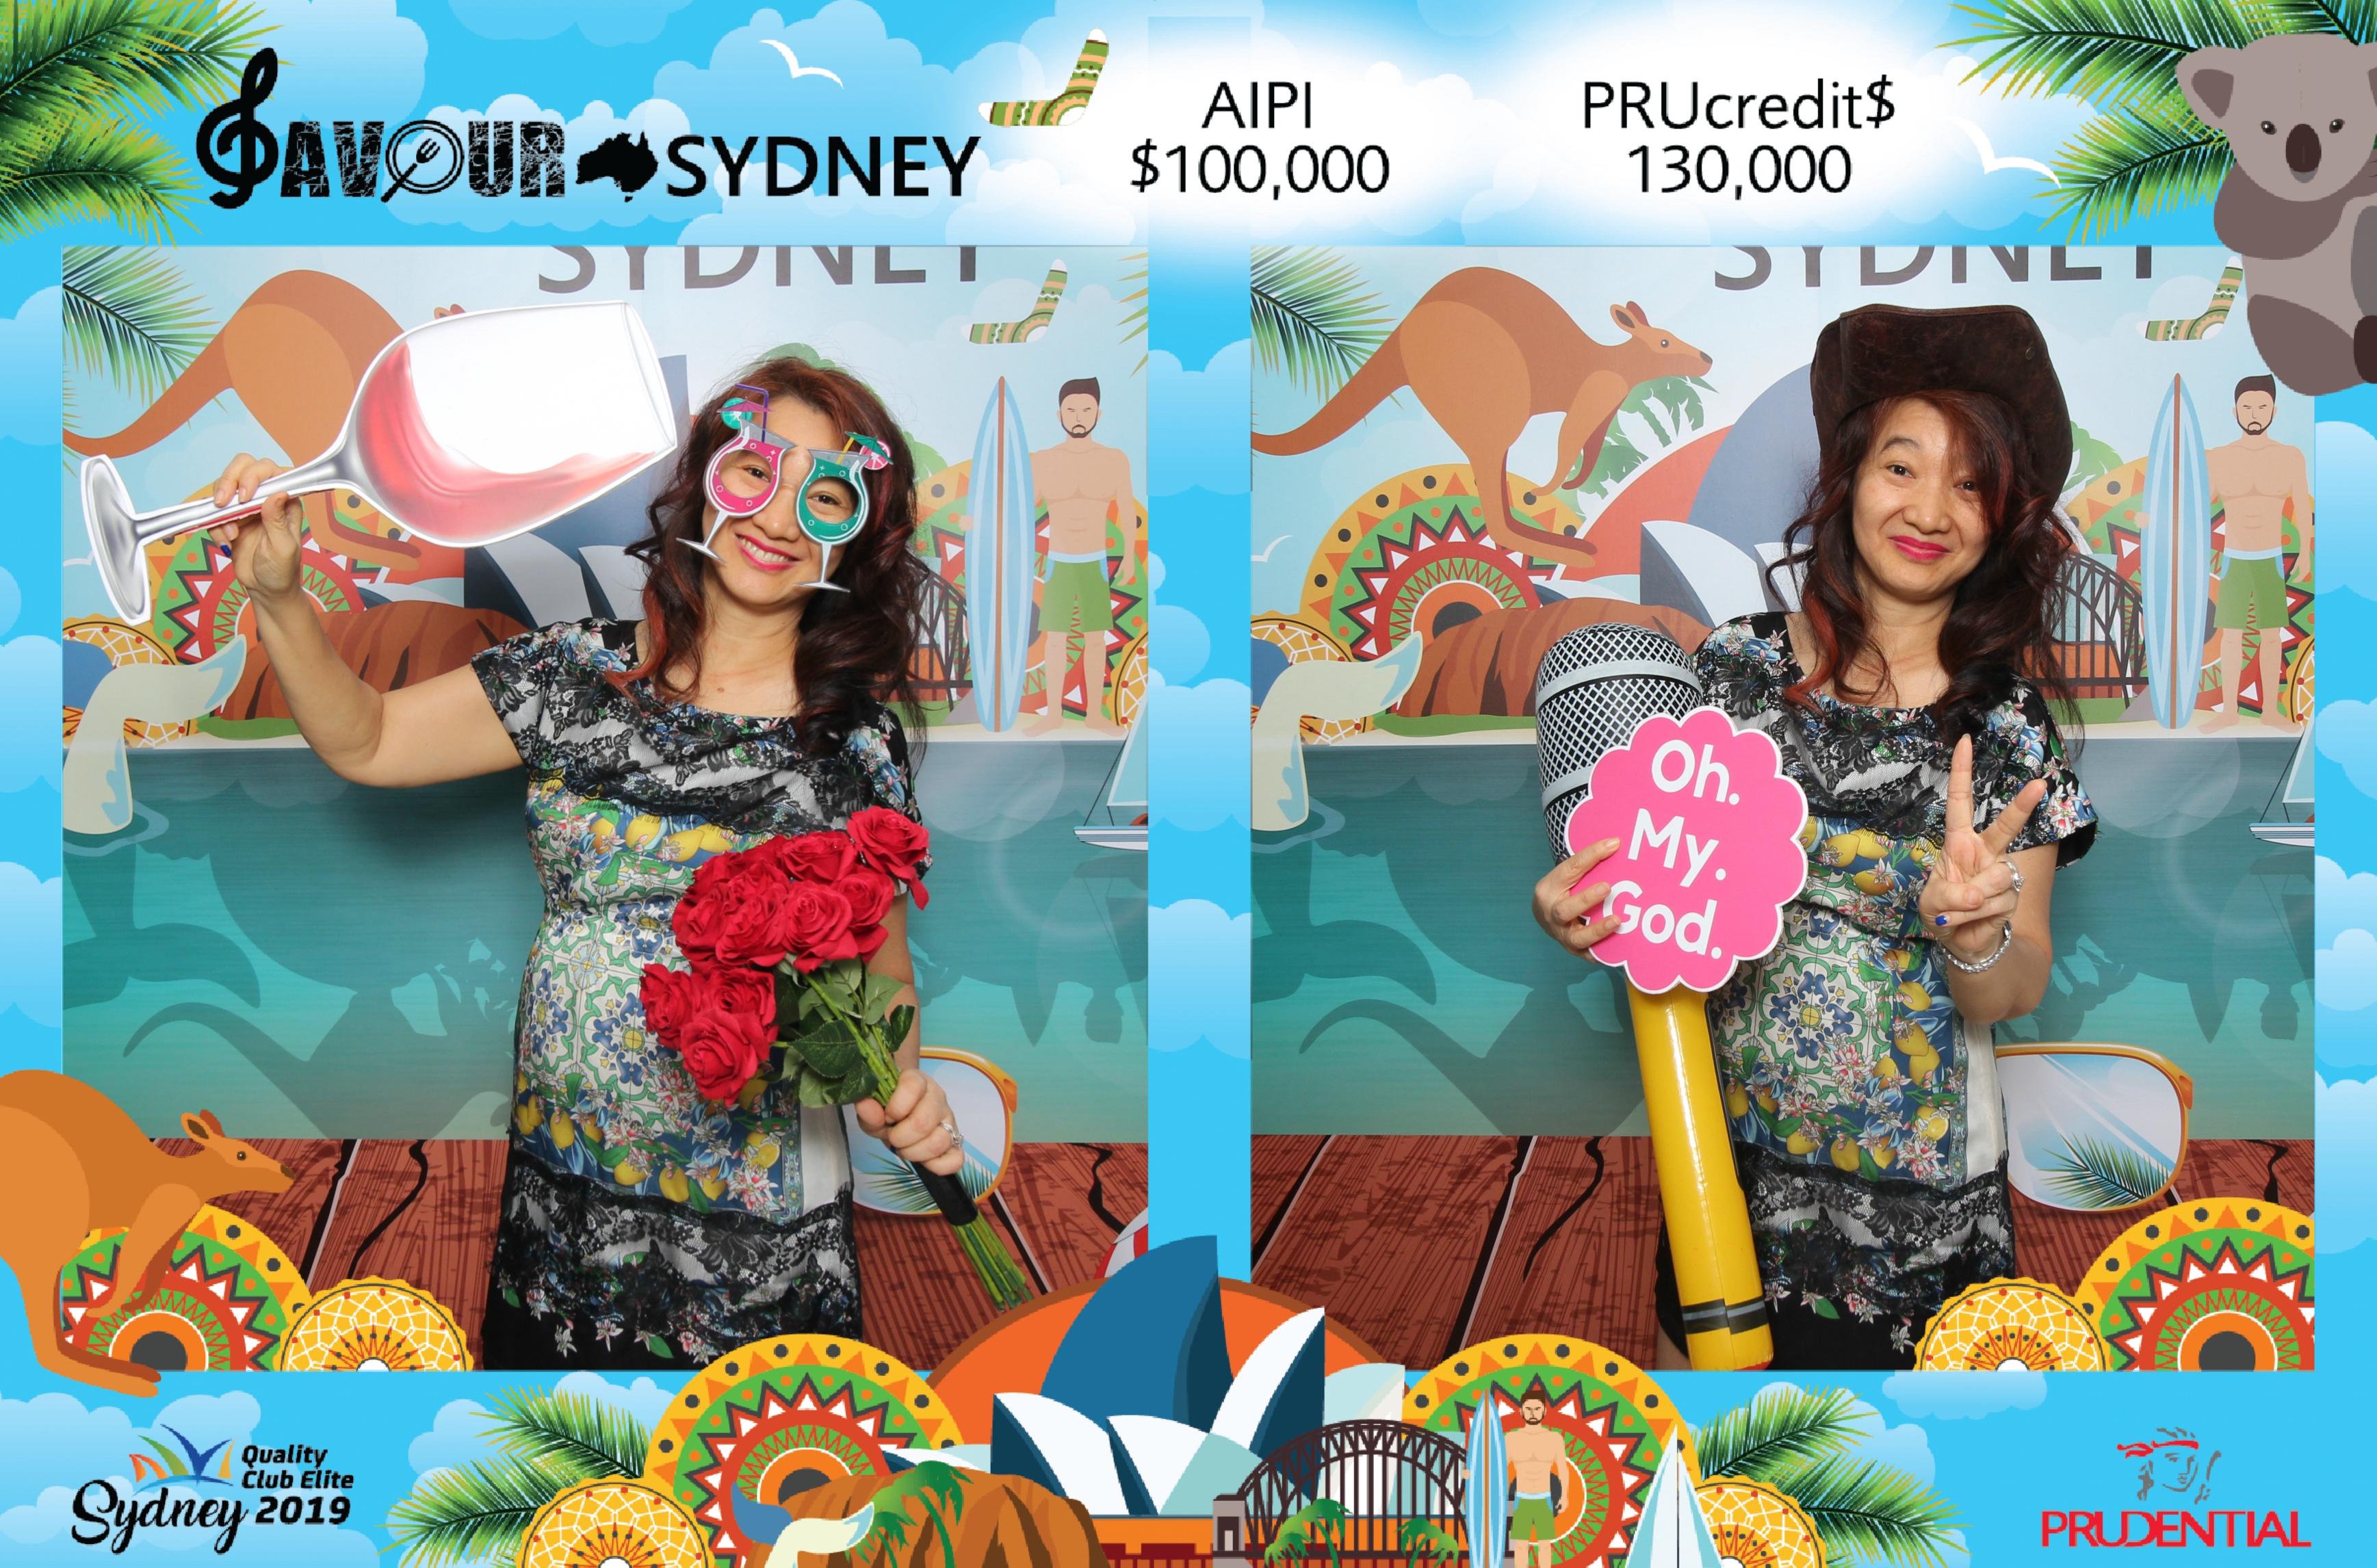 photo booth singapore (45)